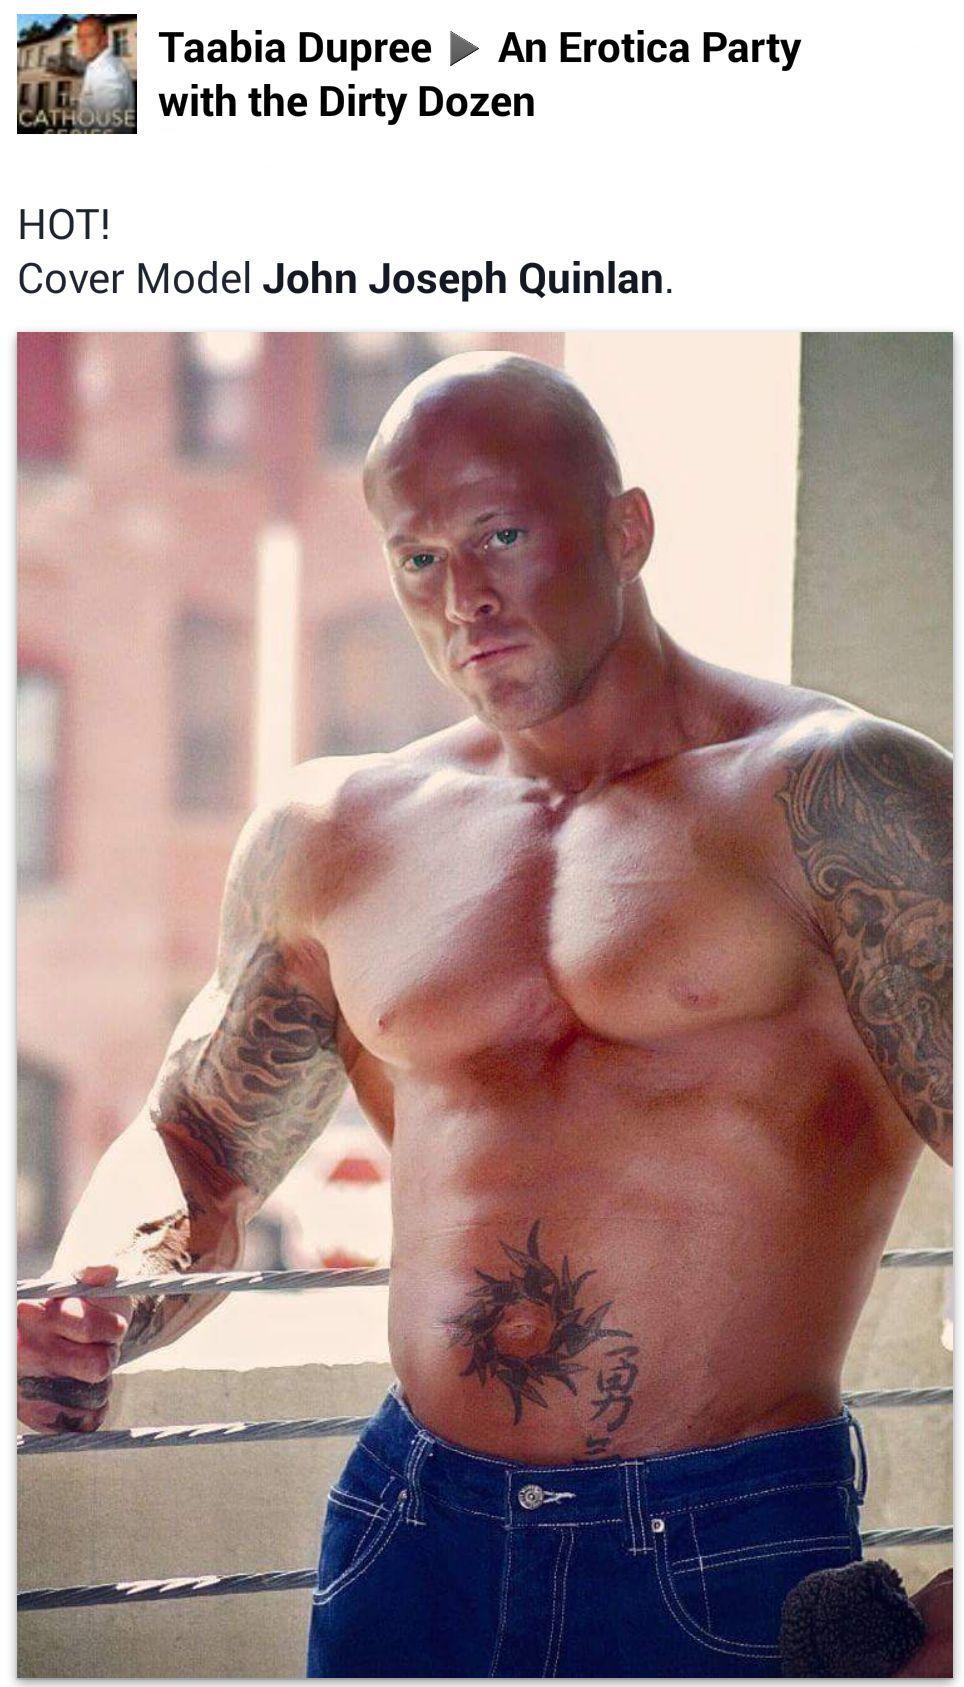 Tattooed Male Romance Cover Model John Joseph Quinlan by Taabia Dupree #JohnQuinlan